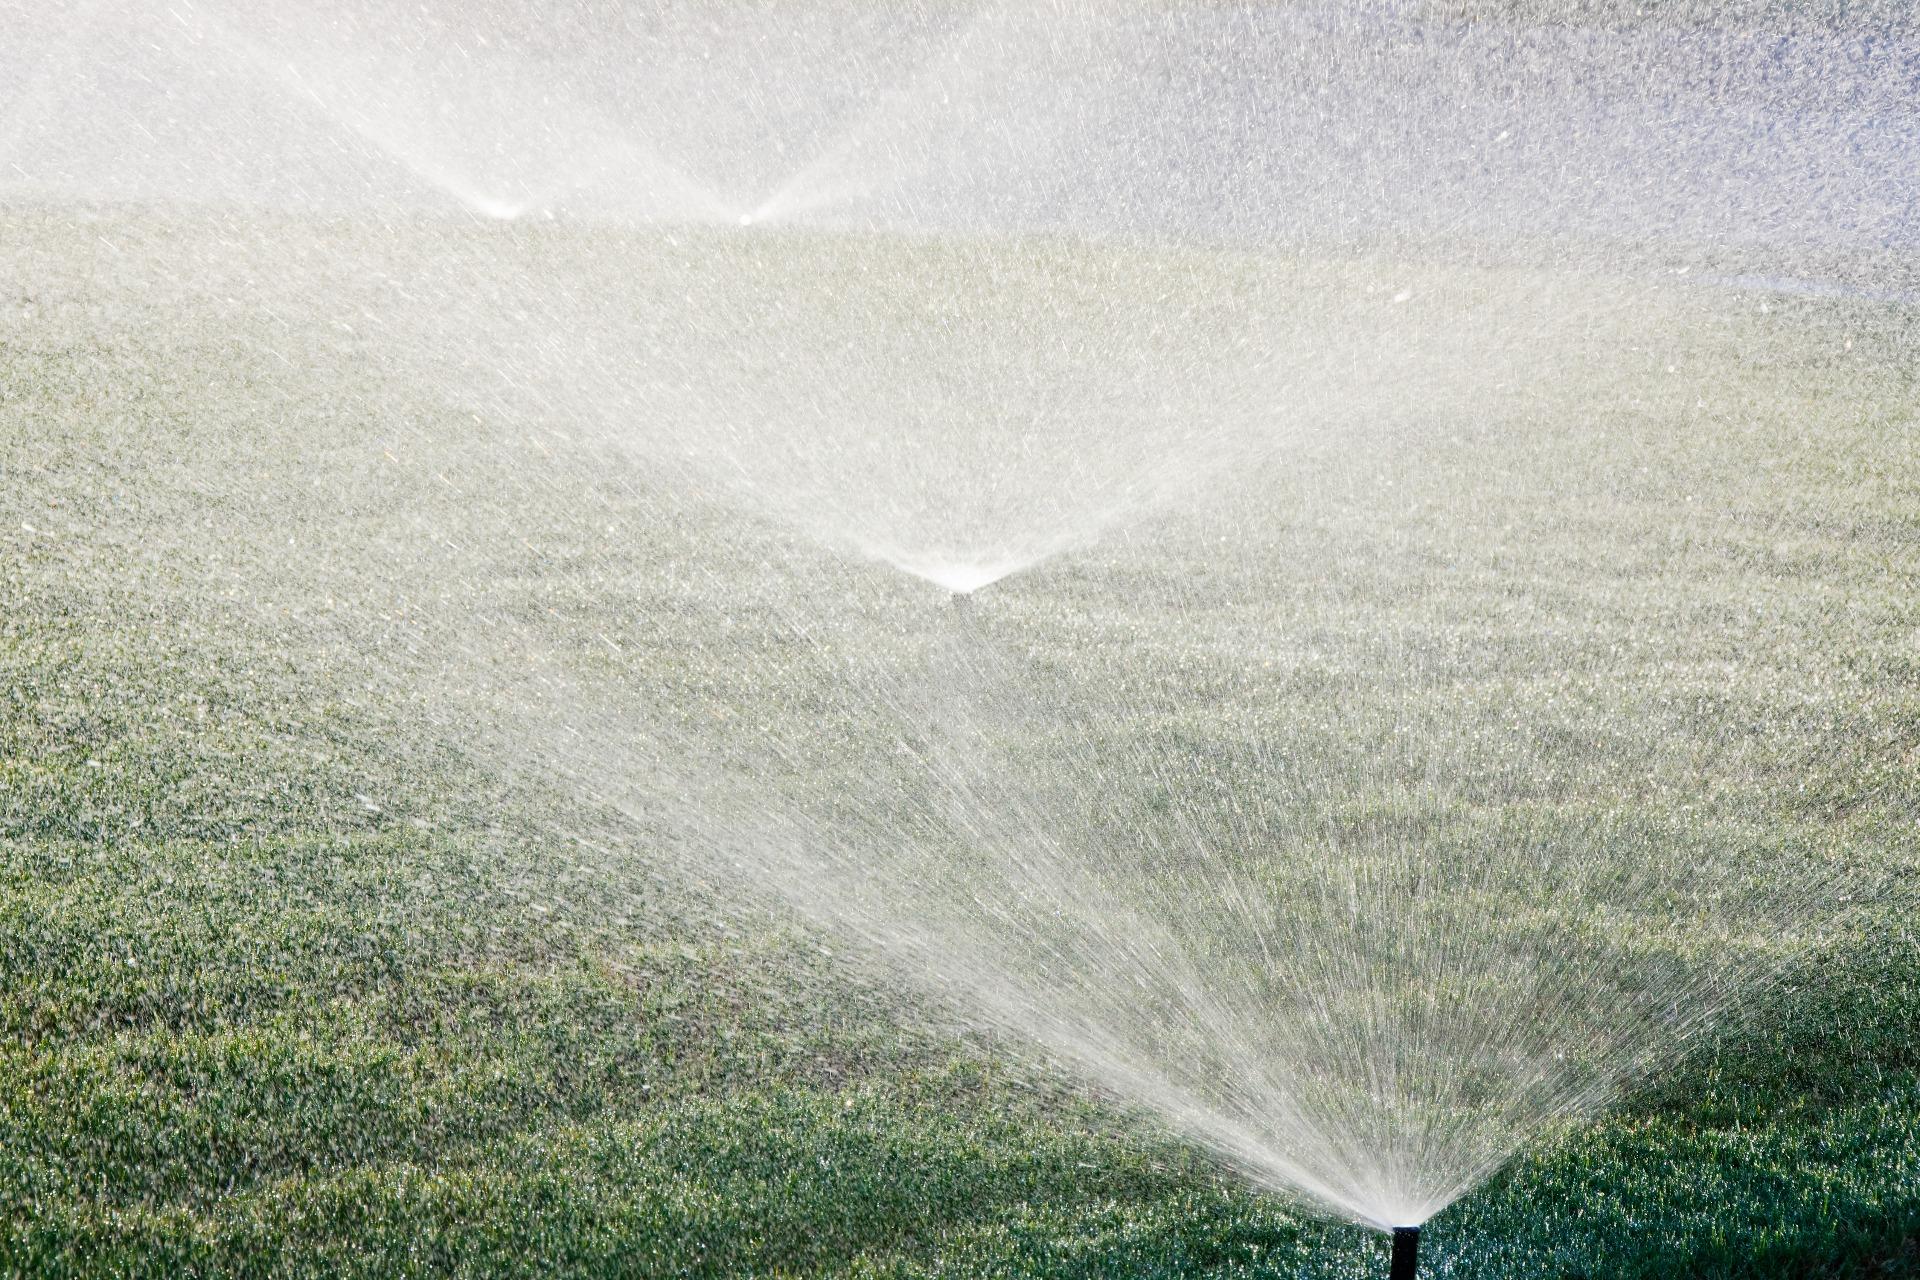 Sprinkler System Repair Services | CJ Outdoor Lighting & Sprinkler Systems